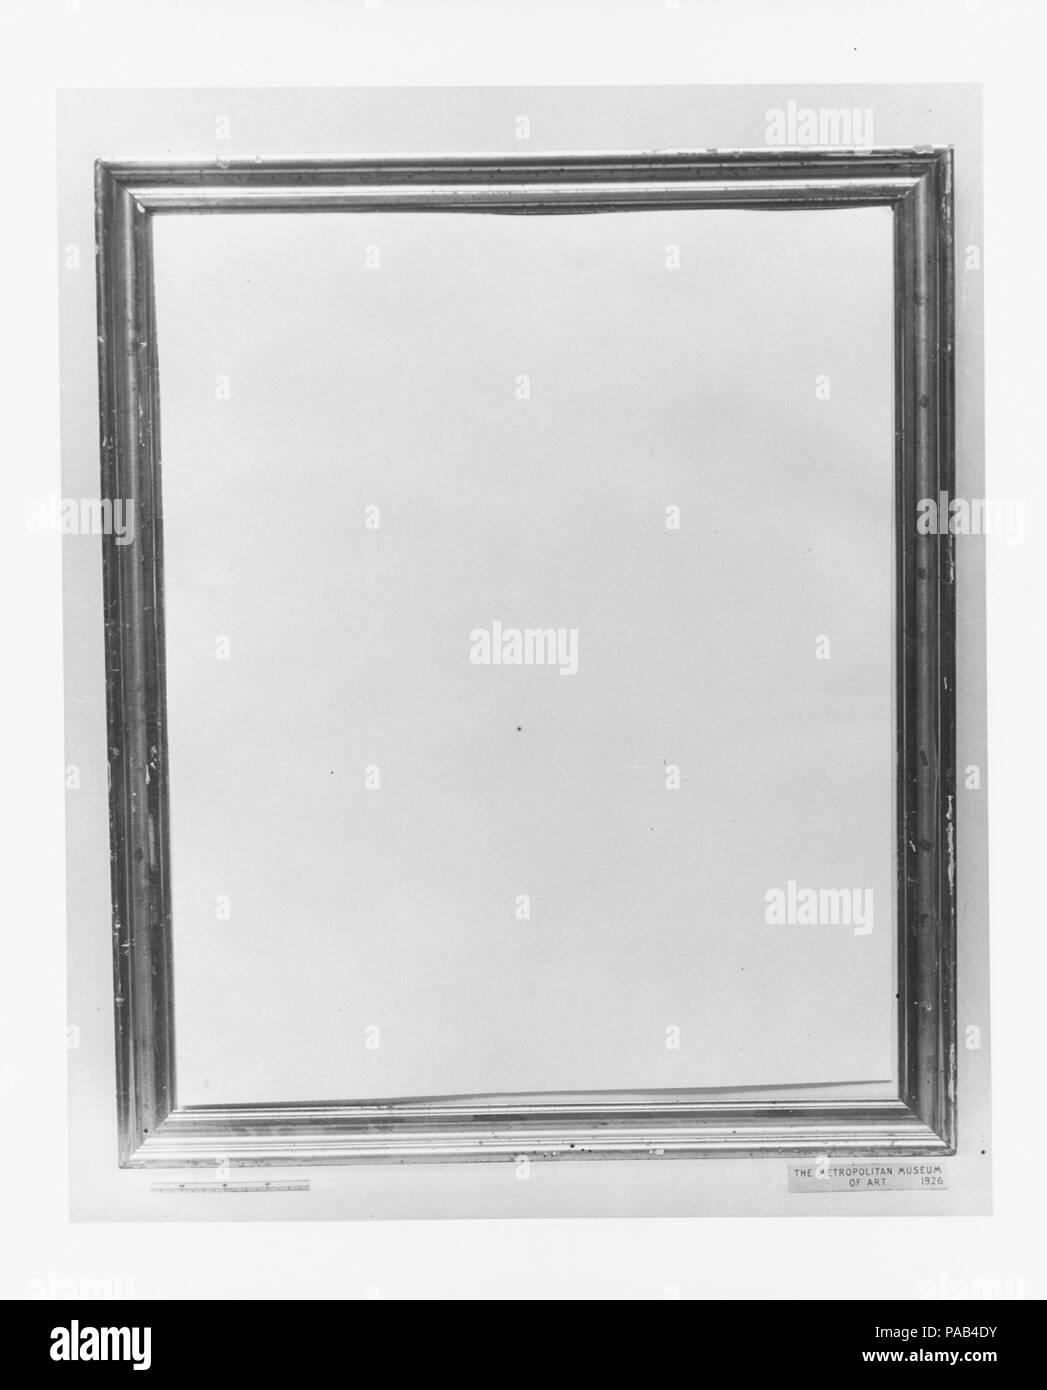 Frame. Dimensions: 24 7/8 x 20 11/16 x 1 in. (63.2 x 52.5 x 2.5 cm ...